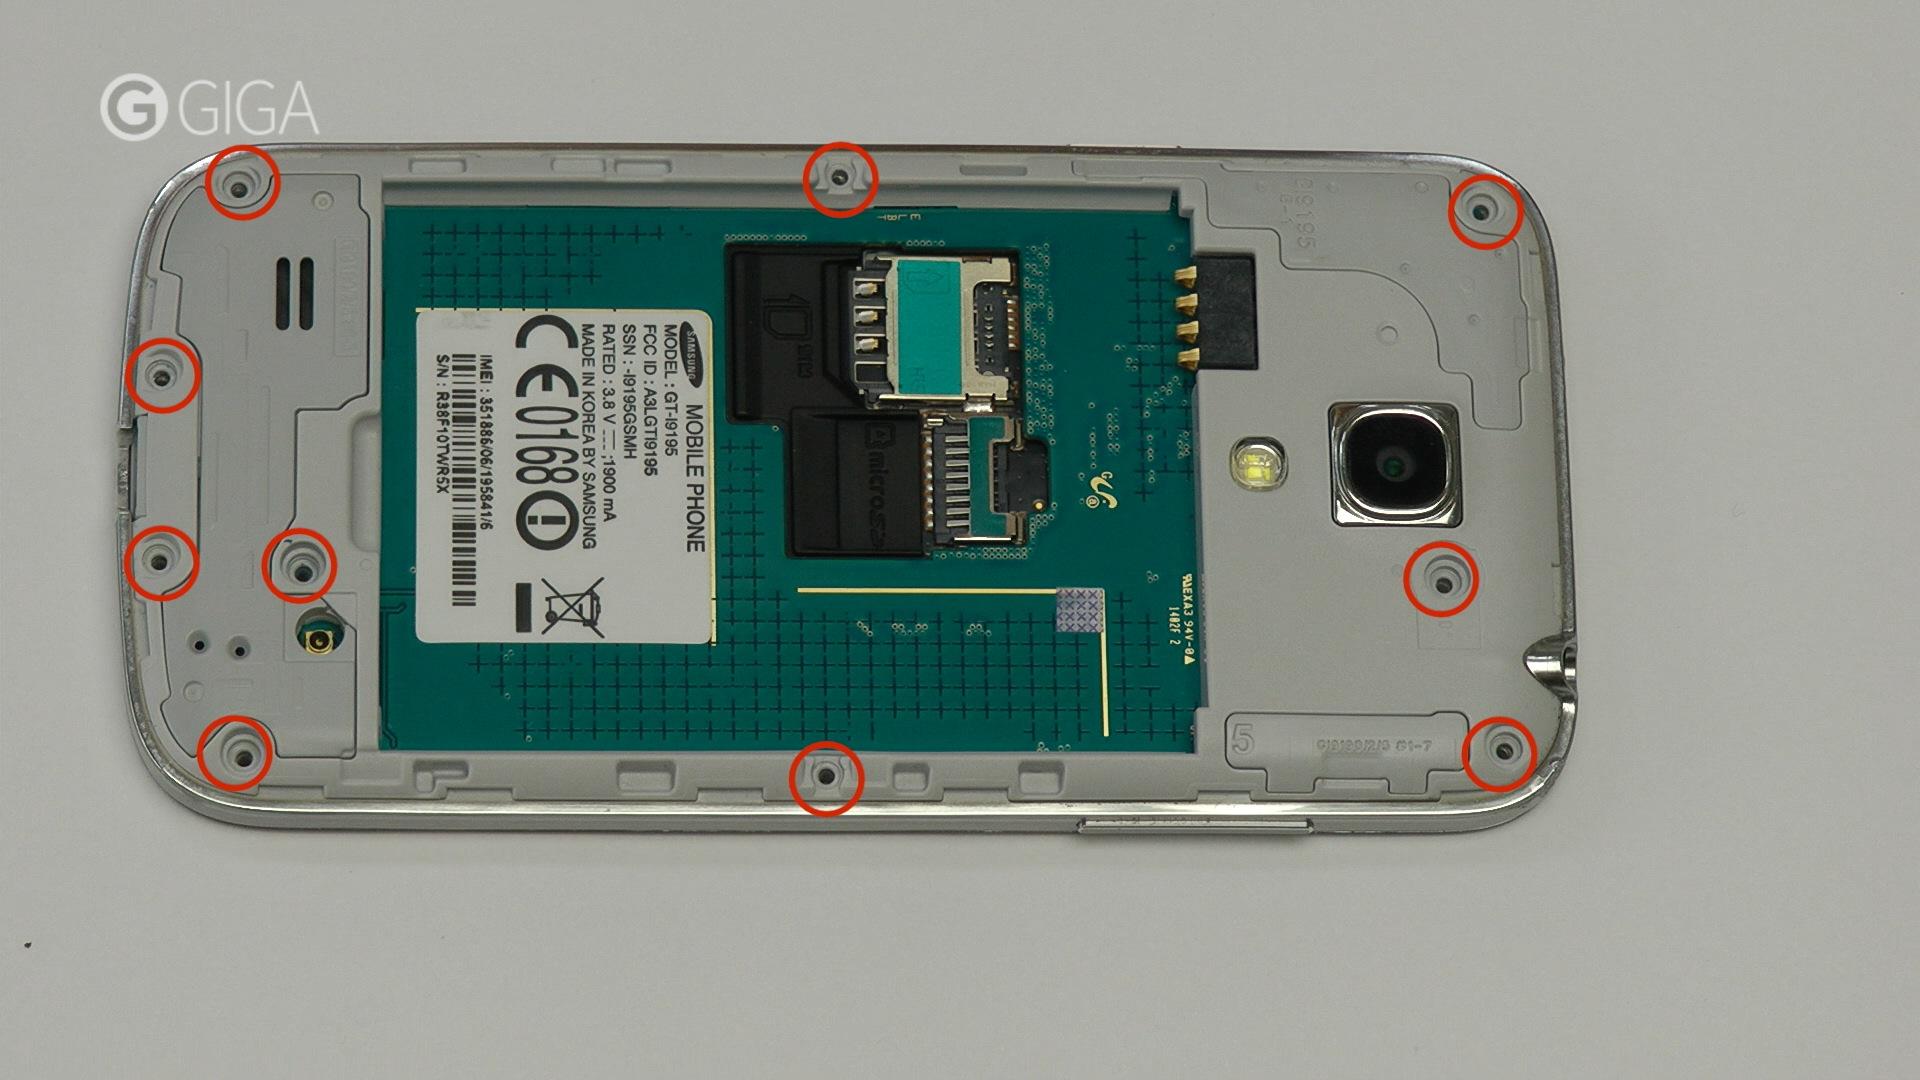 Samsung Galaxy S4 mini: USB-Ladebuchse, Mikro wechseln – GIGA